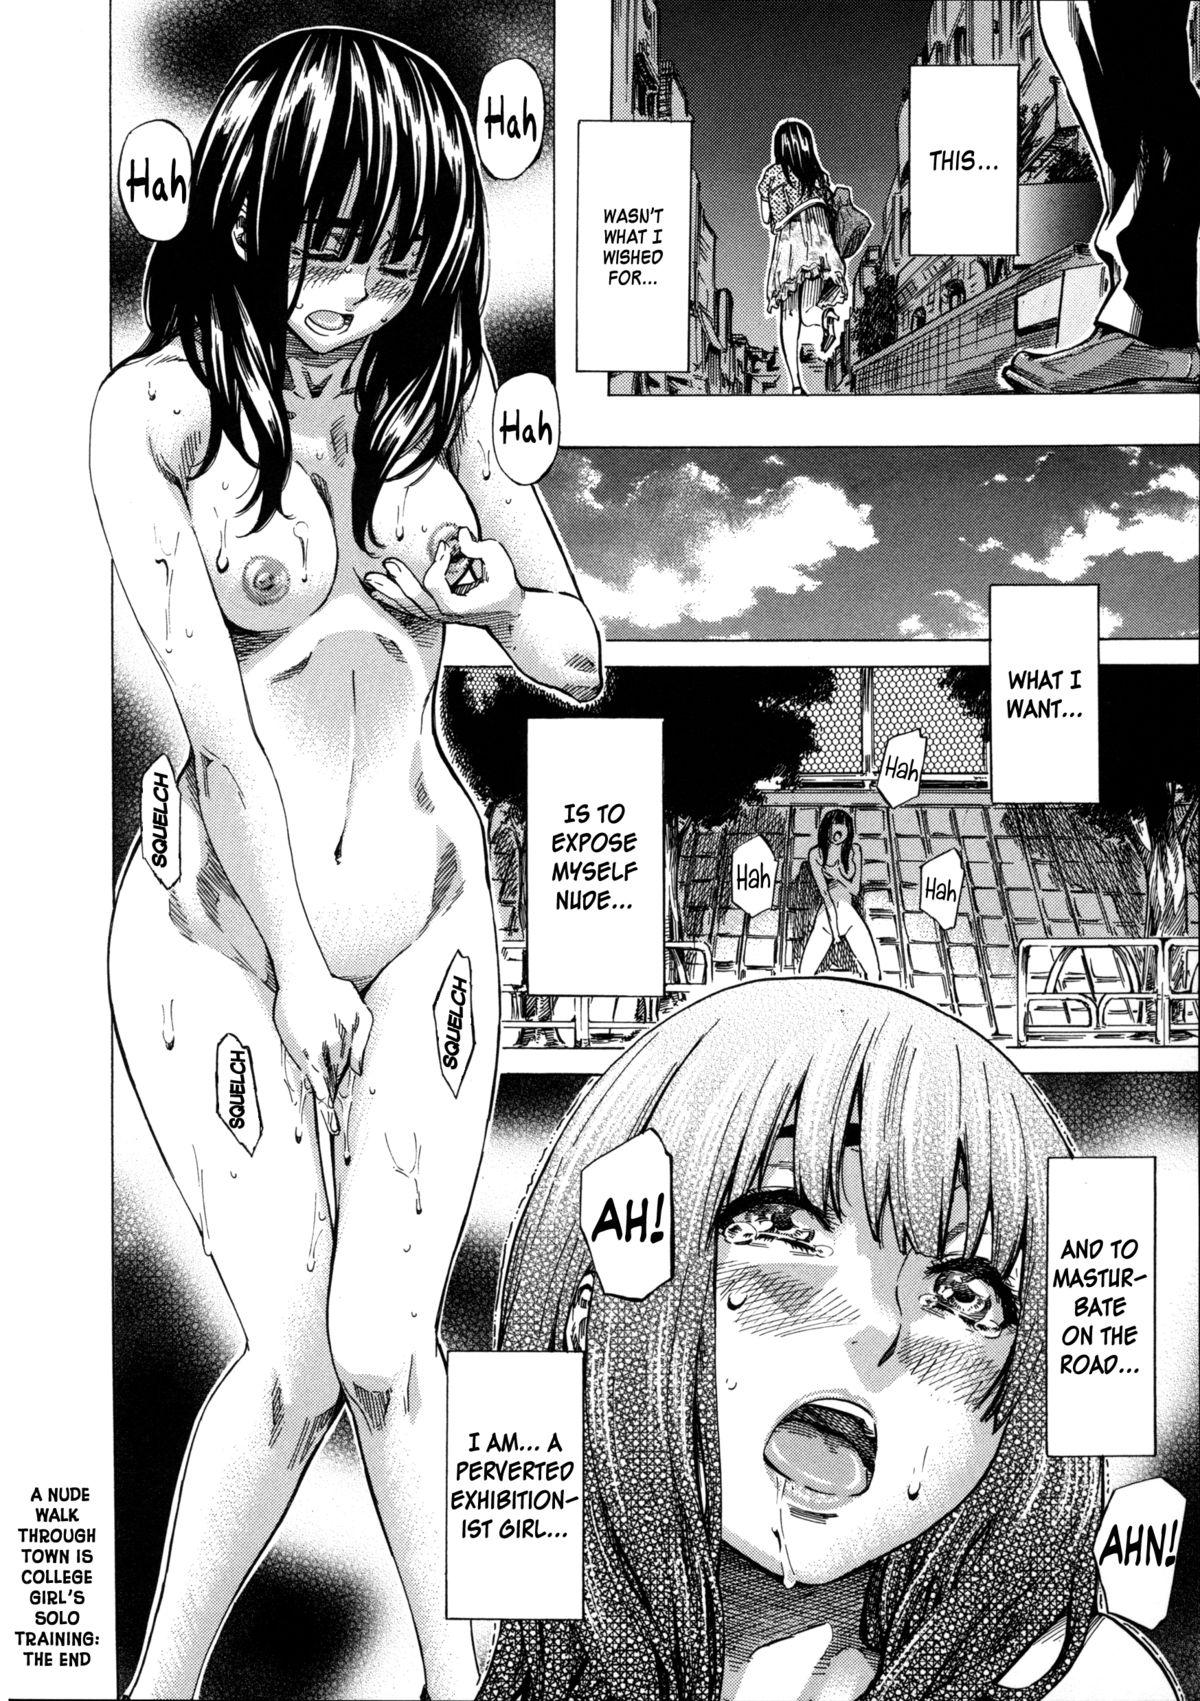 Kashiwazaki Miki wa Ironna Basho de Zenra Sanpo Shitemita | Miki Kashiwazaki Goes Naked in All Sorts of Places 88